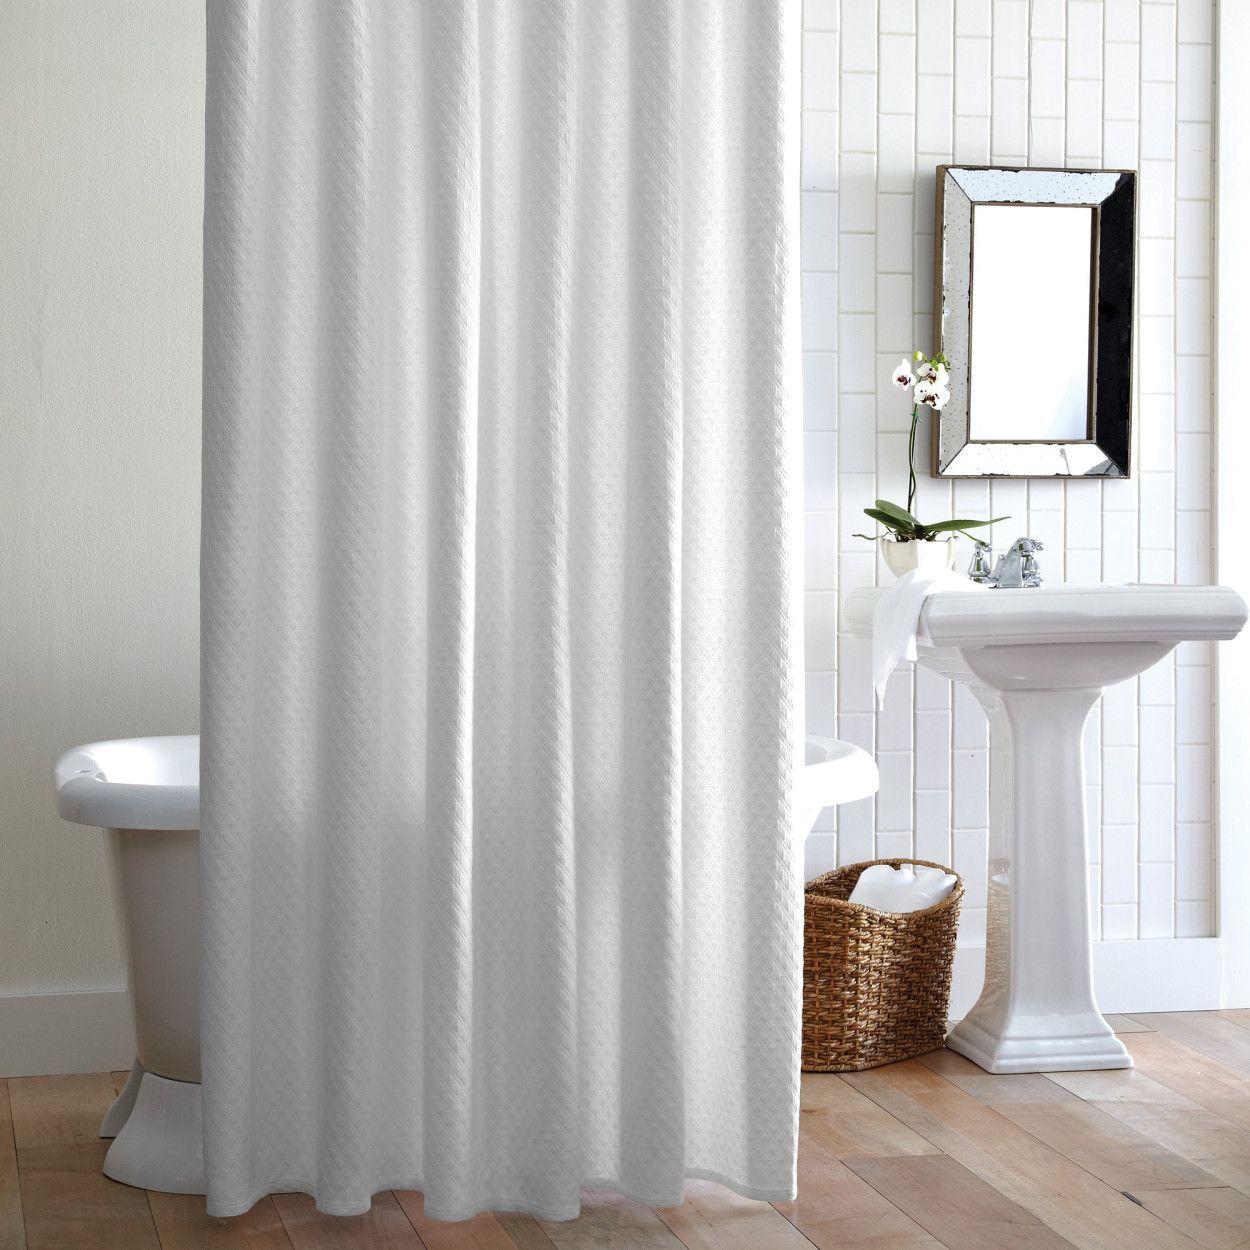 Jubilee Robe Cotton Shower Curtain Shower Curtain White Shower